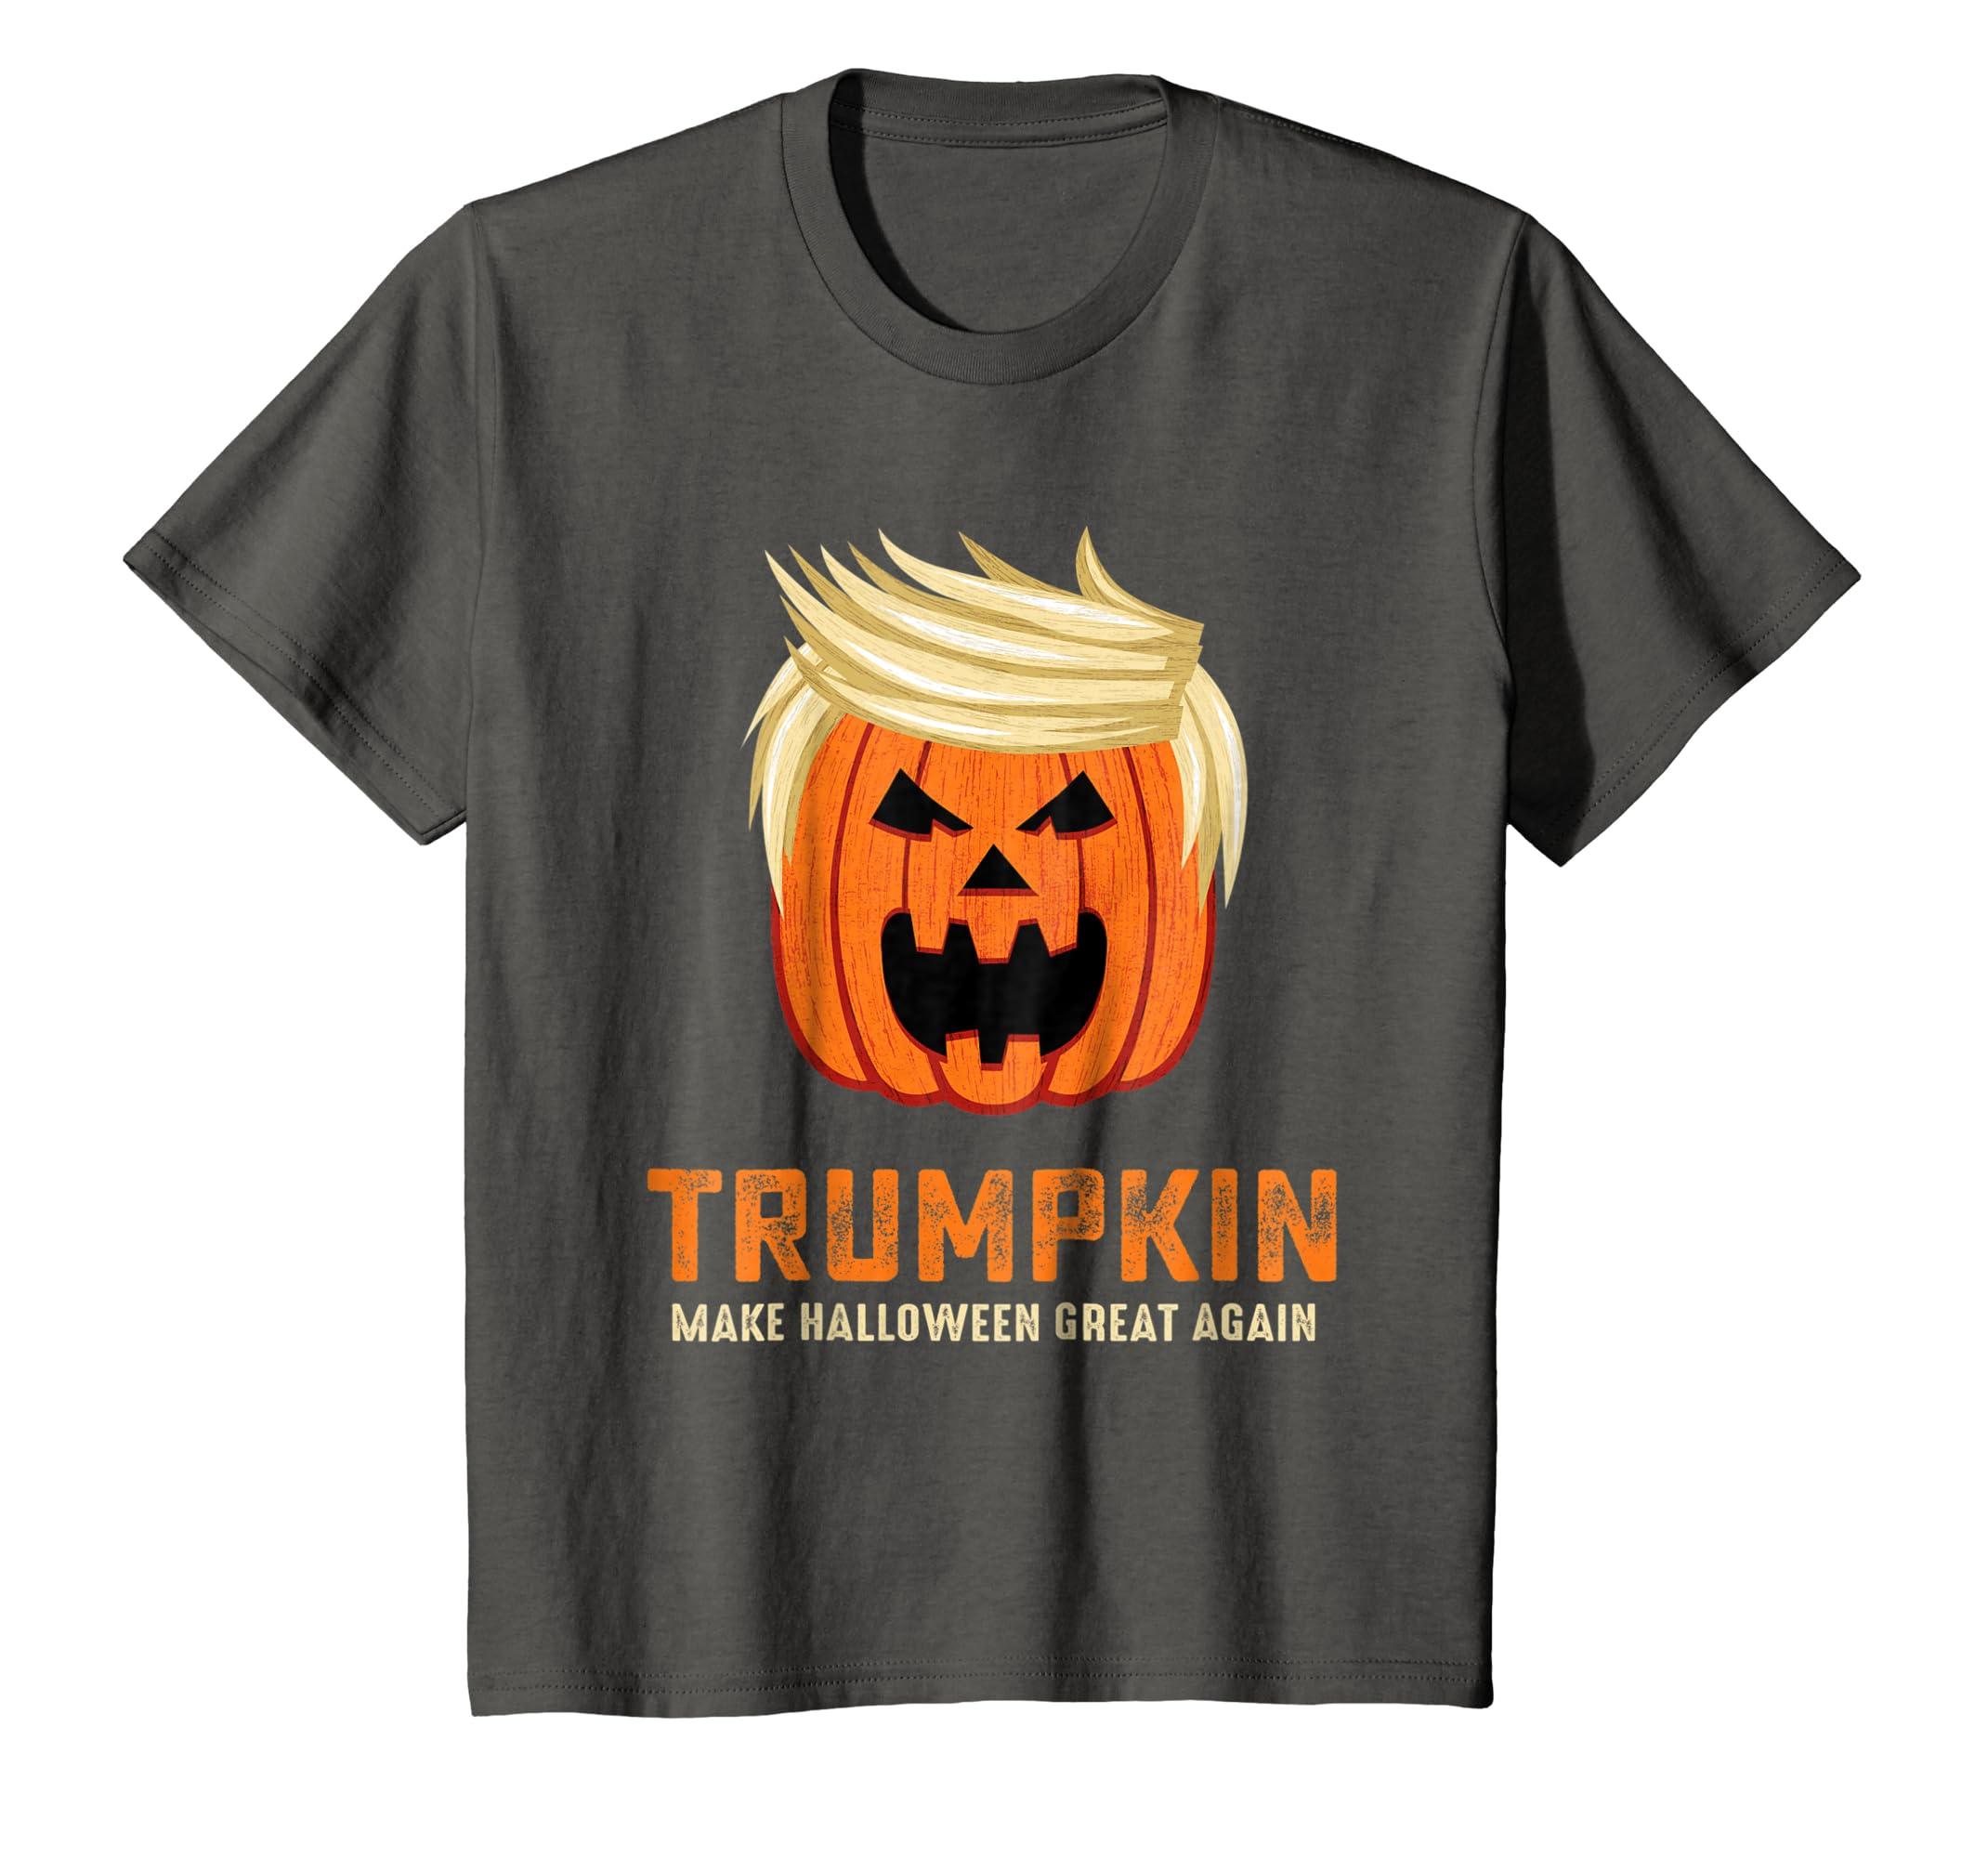 dc4fcf4e Amazon.com: Halloween Trumpkin Funny T-Shirt: Clothing